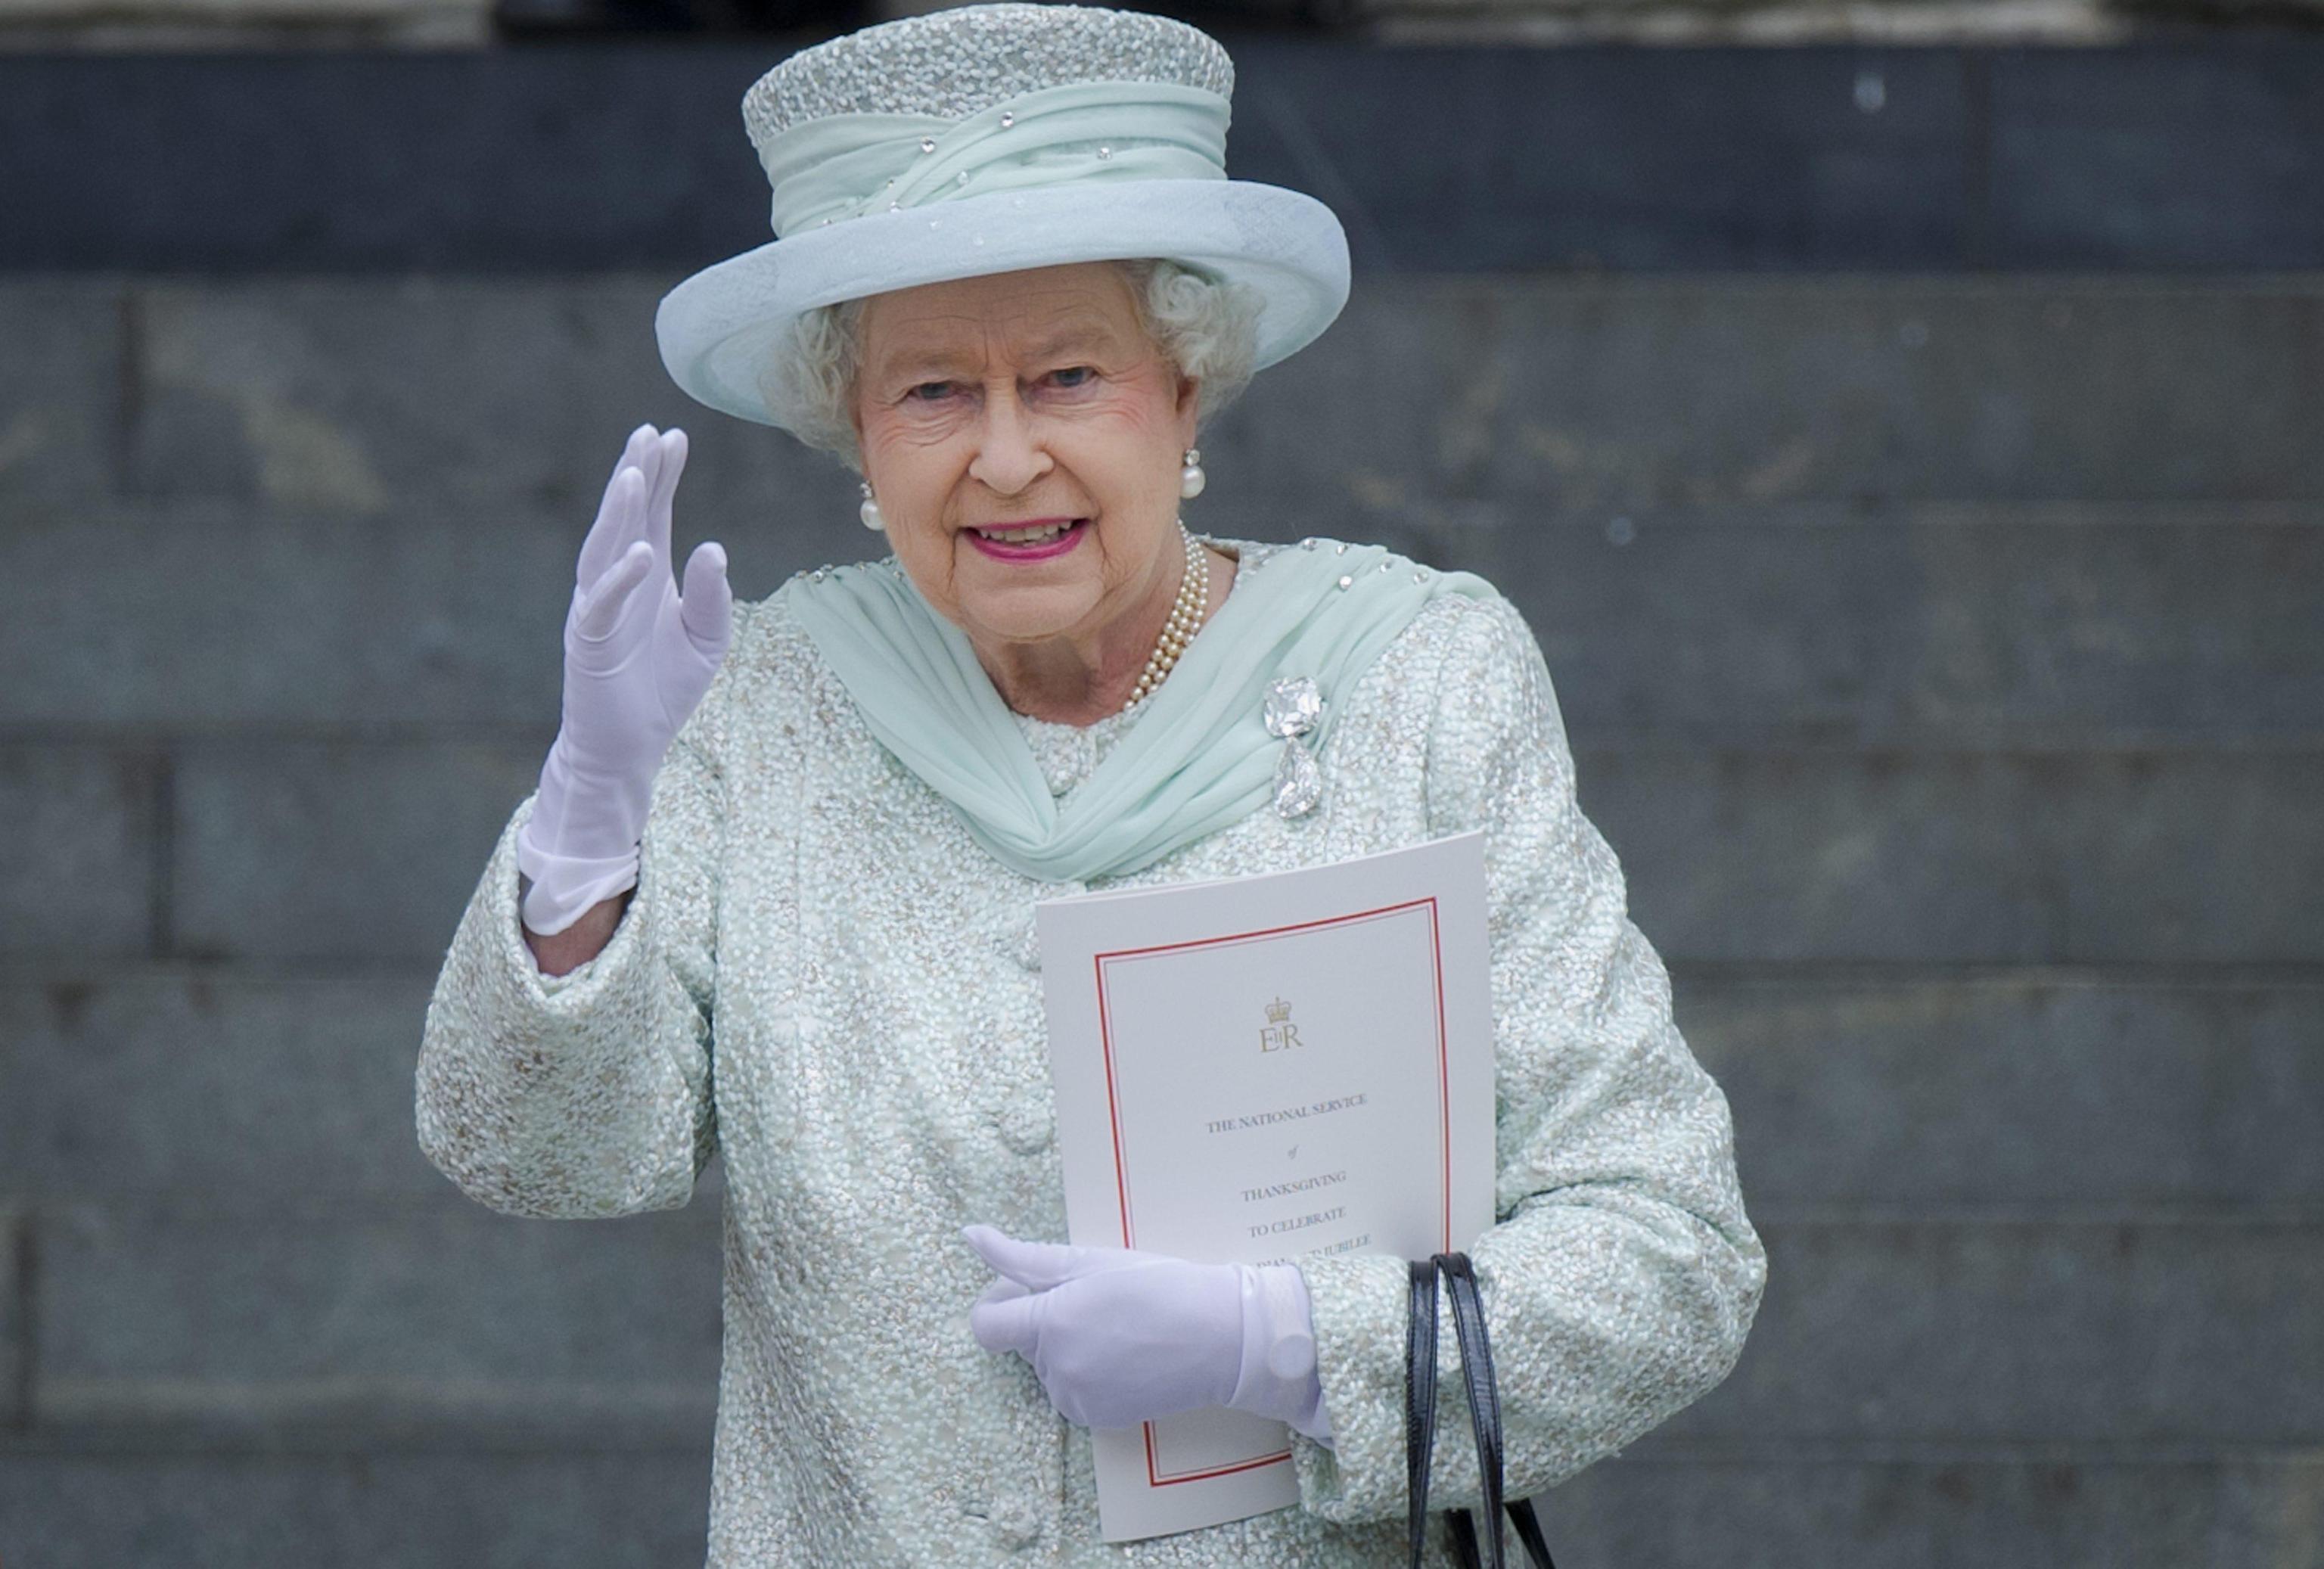 Elisabetta II creatrice del suo 'Queen style'